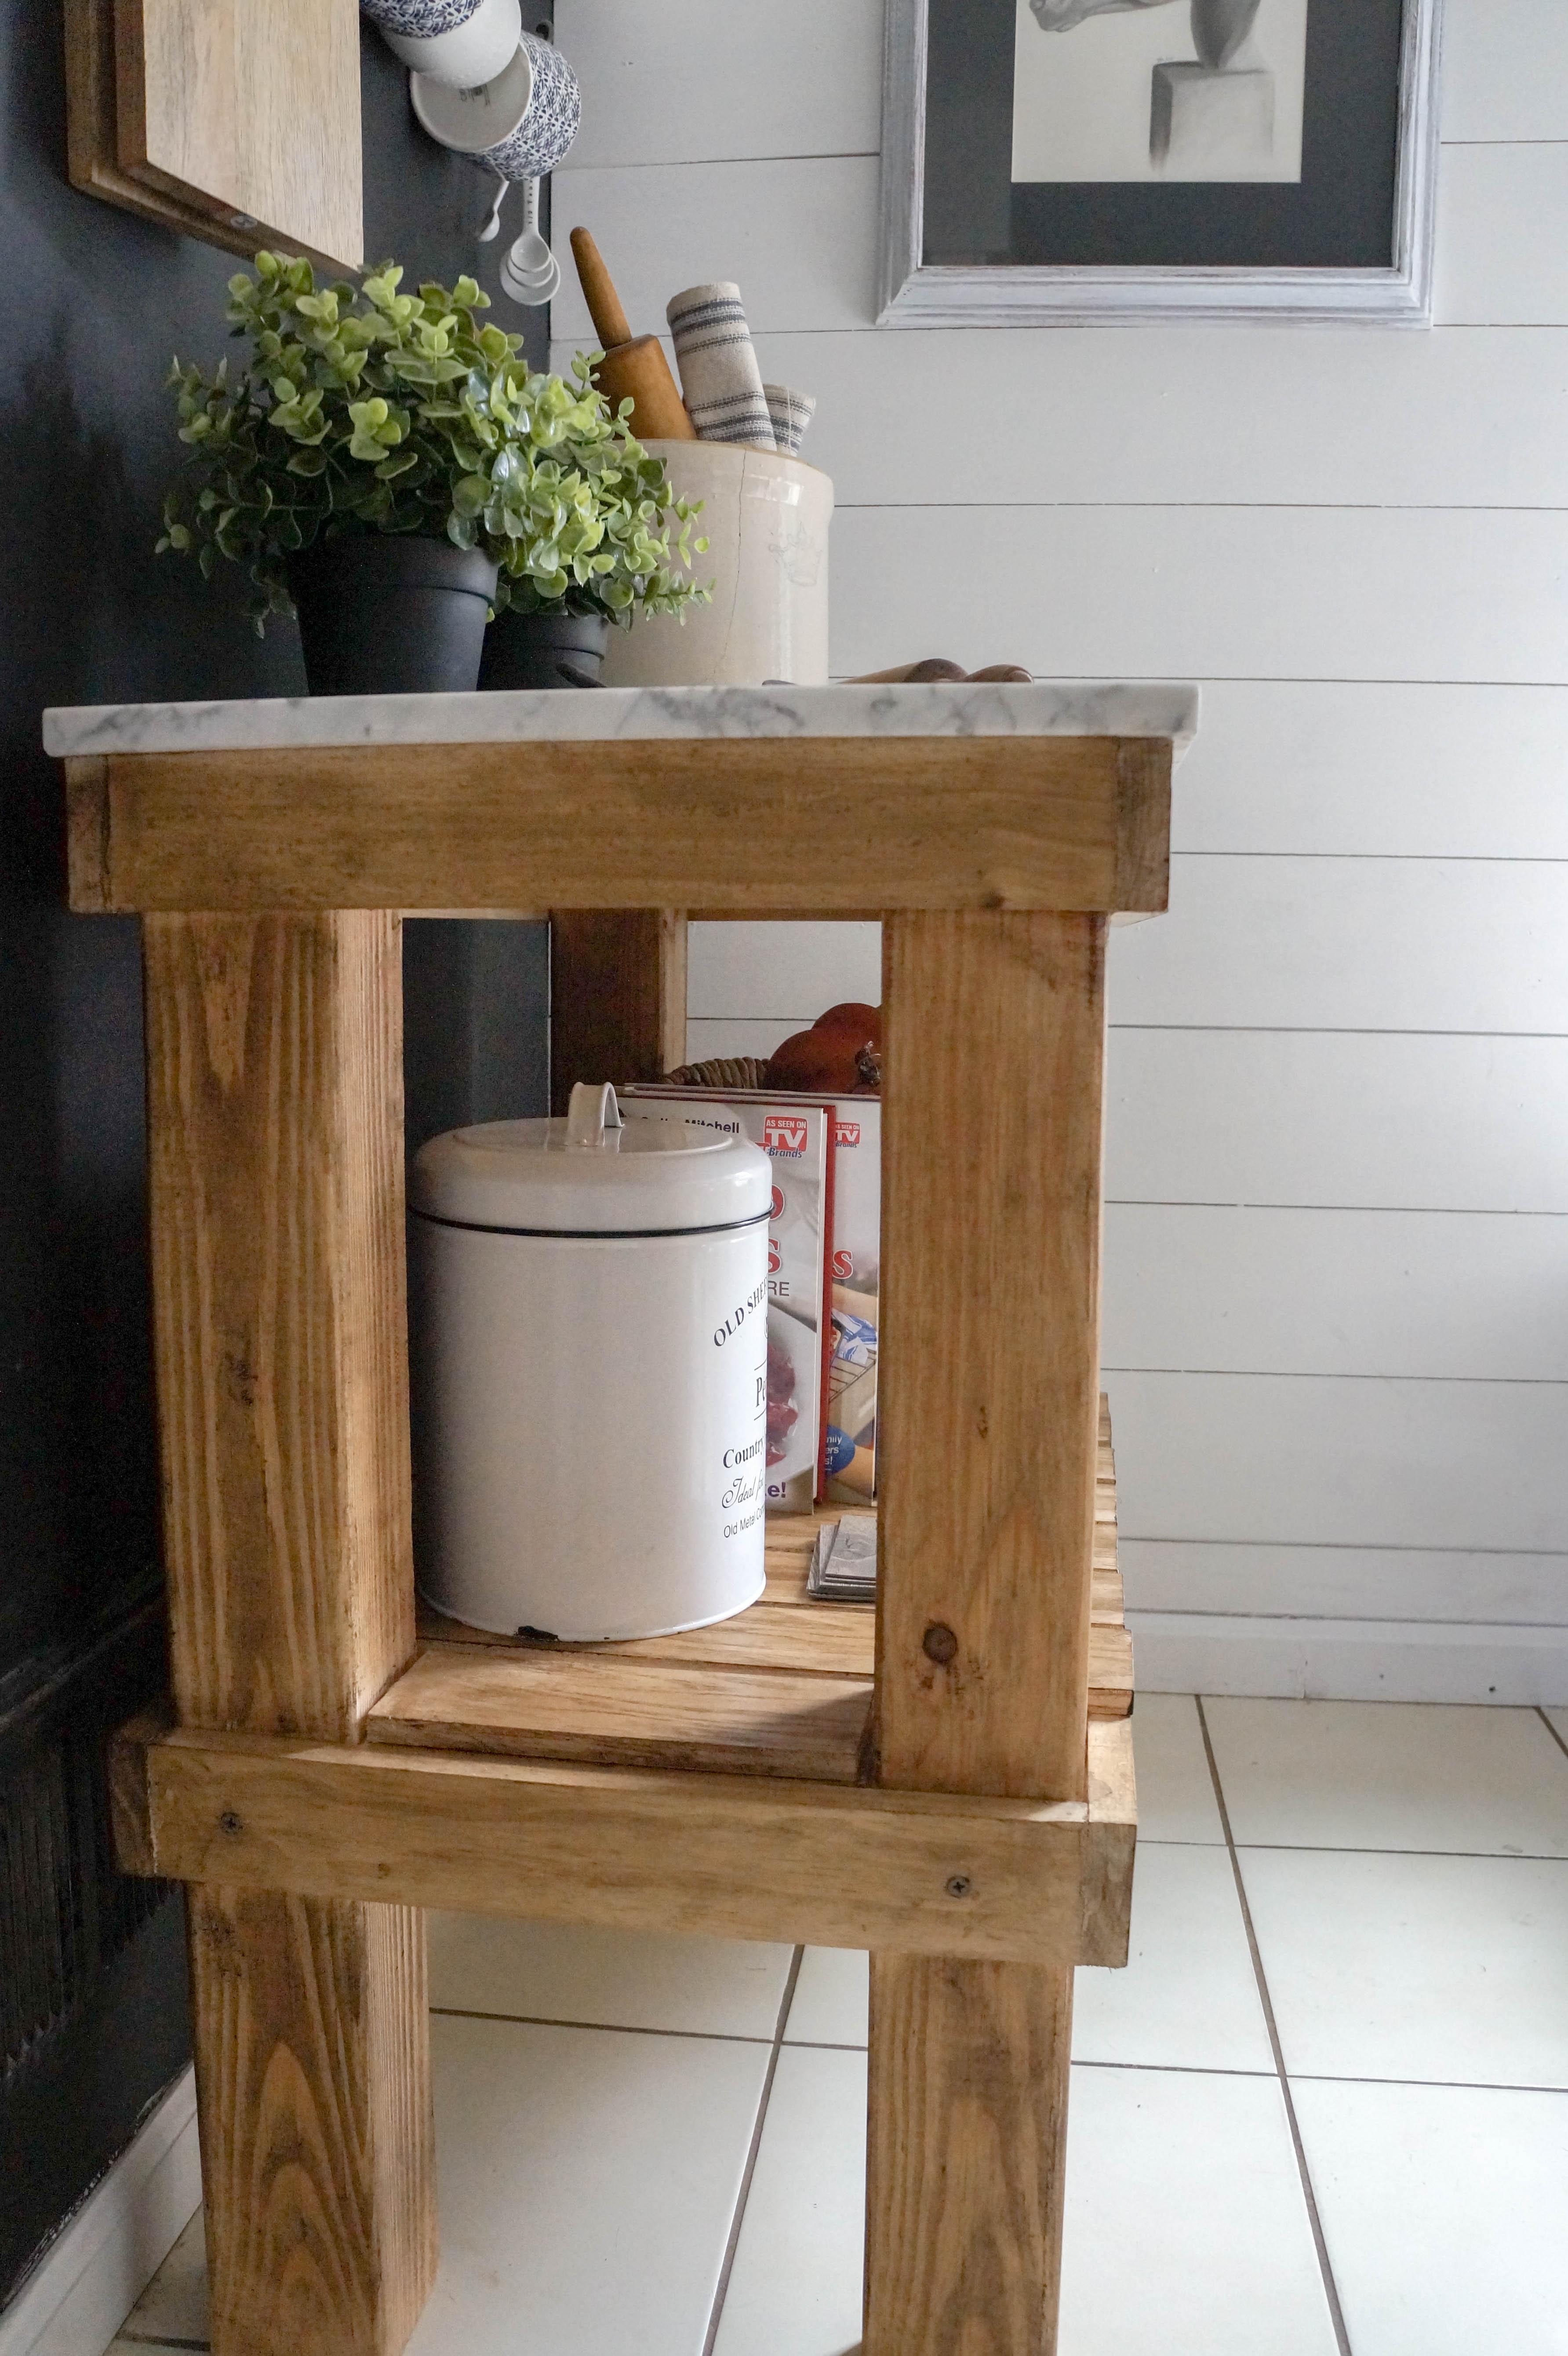 Kitchen Cart: DIY Rustic Cart with Marble Top - Seeking ...